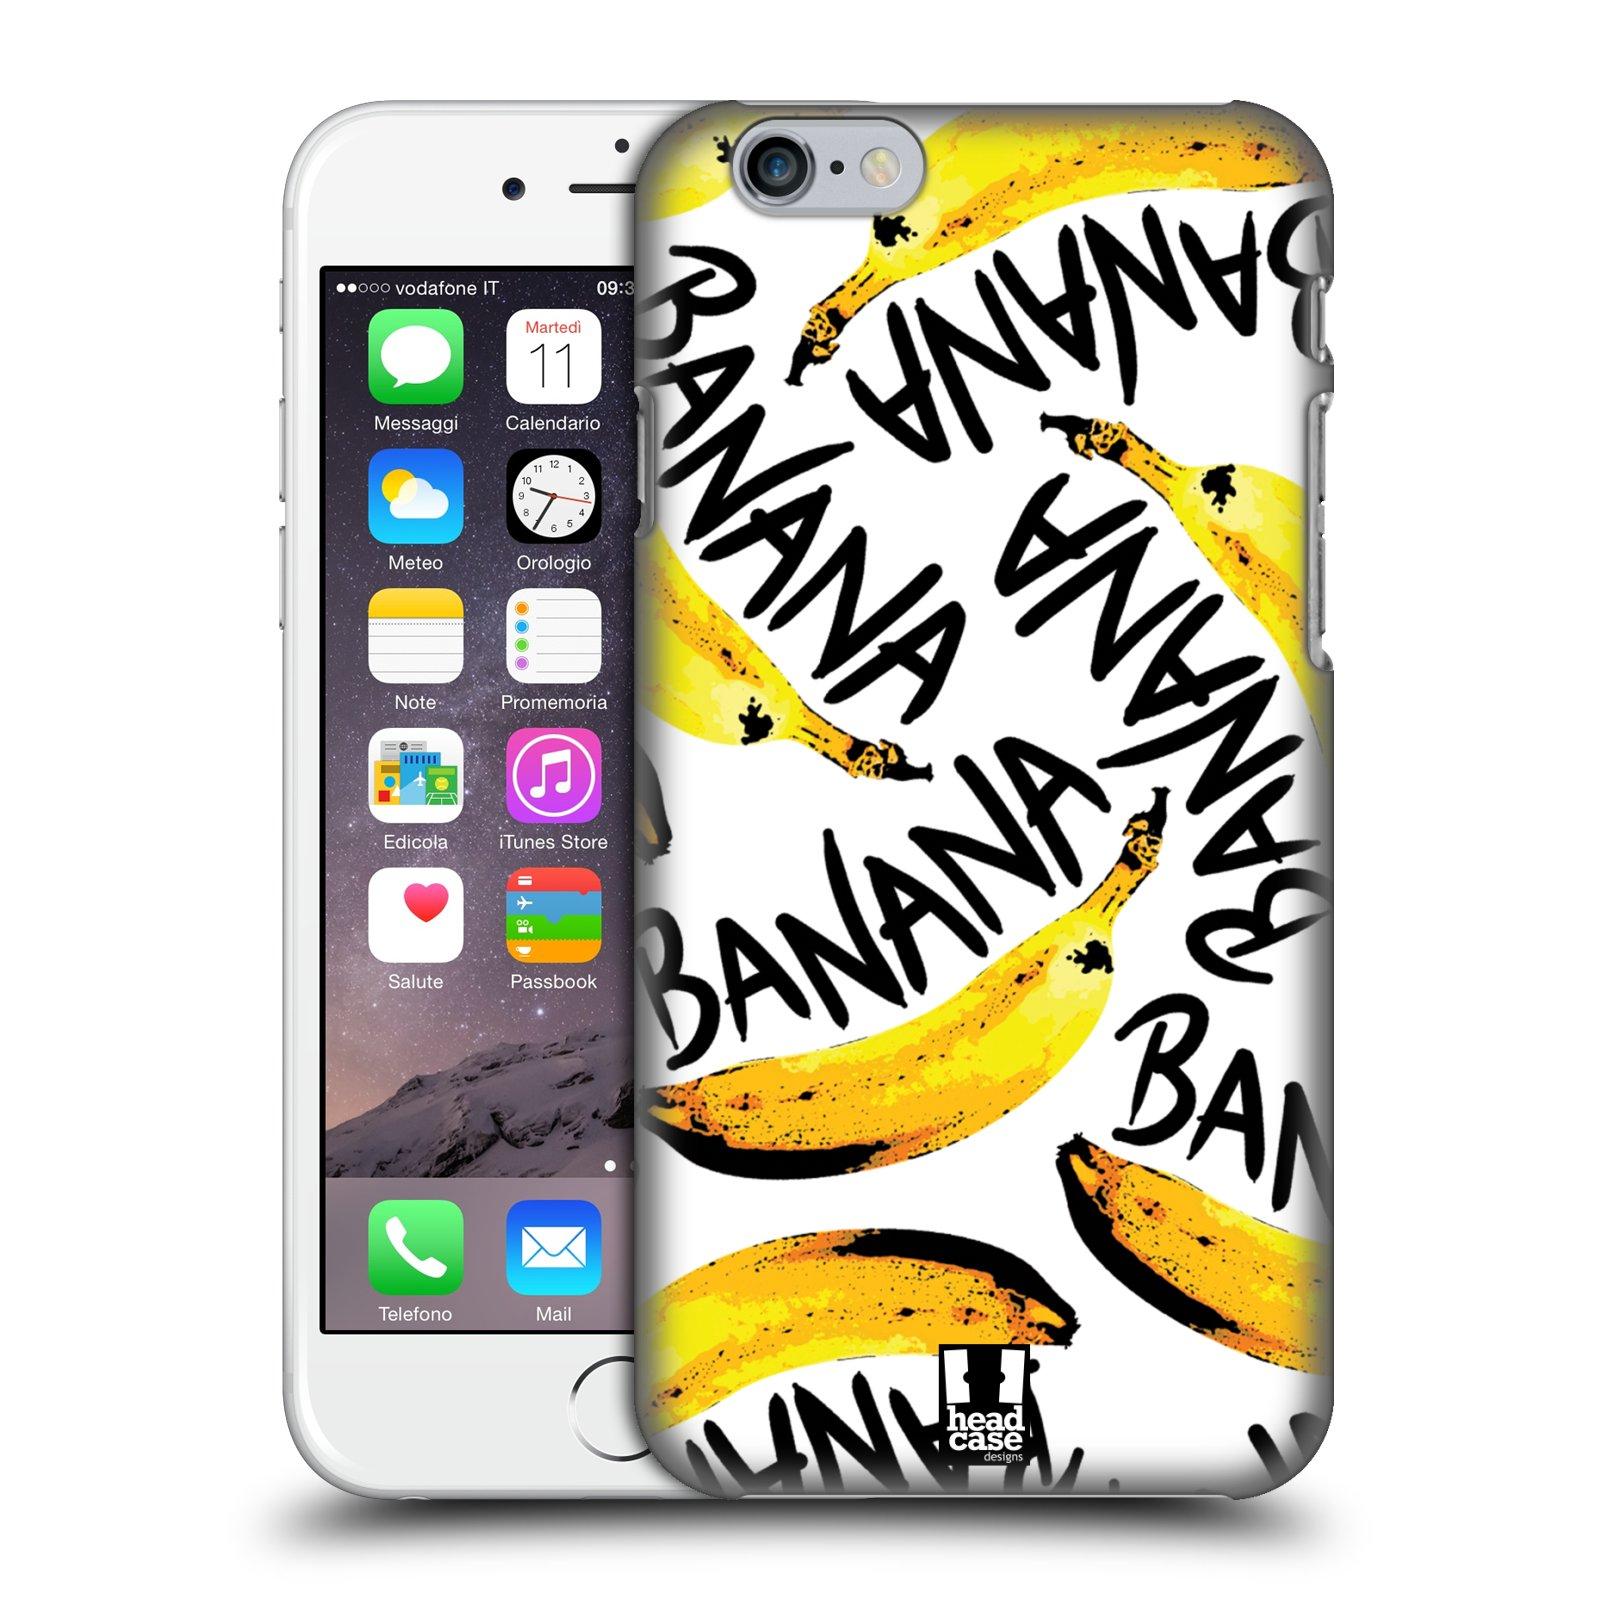 HEAD-CASE-DESIGNS-BANANAS-HARD-BACK-CASE-FOR-APPLE-iPHONE-PHONES